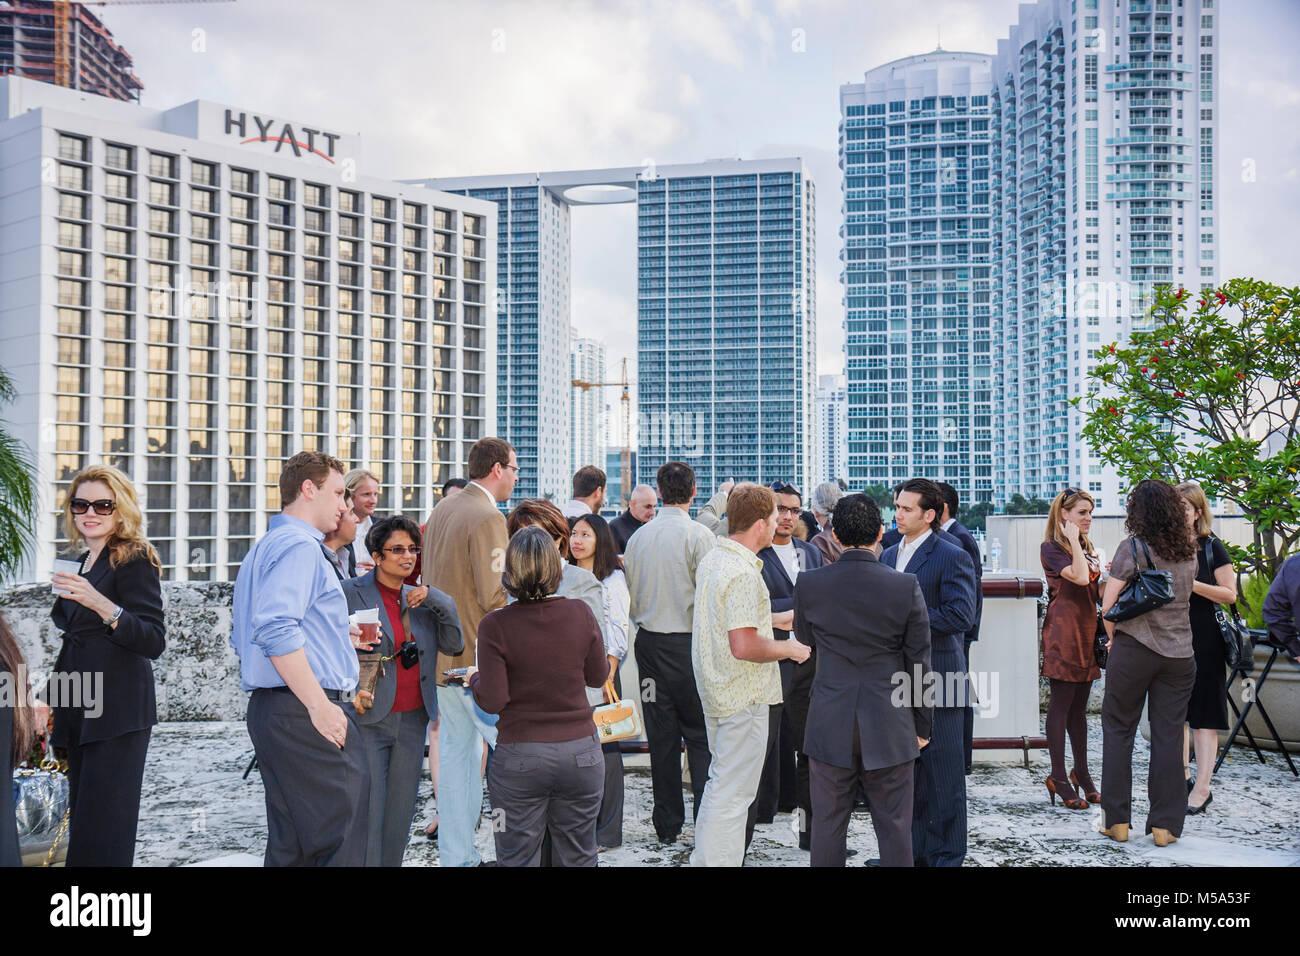 networking professional reception men women Hyatt Hotel high rise condominiums - Stock Image